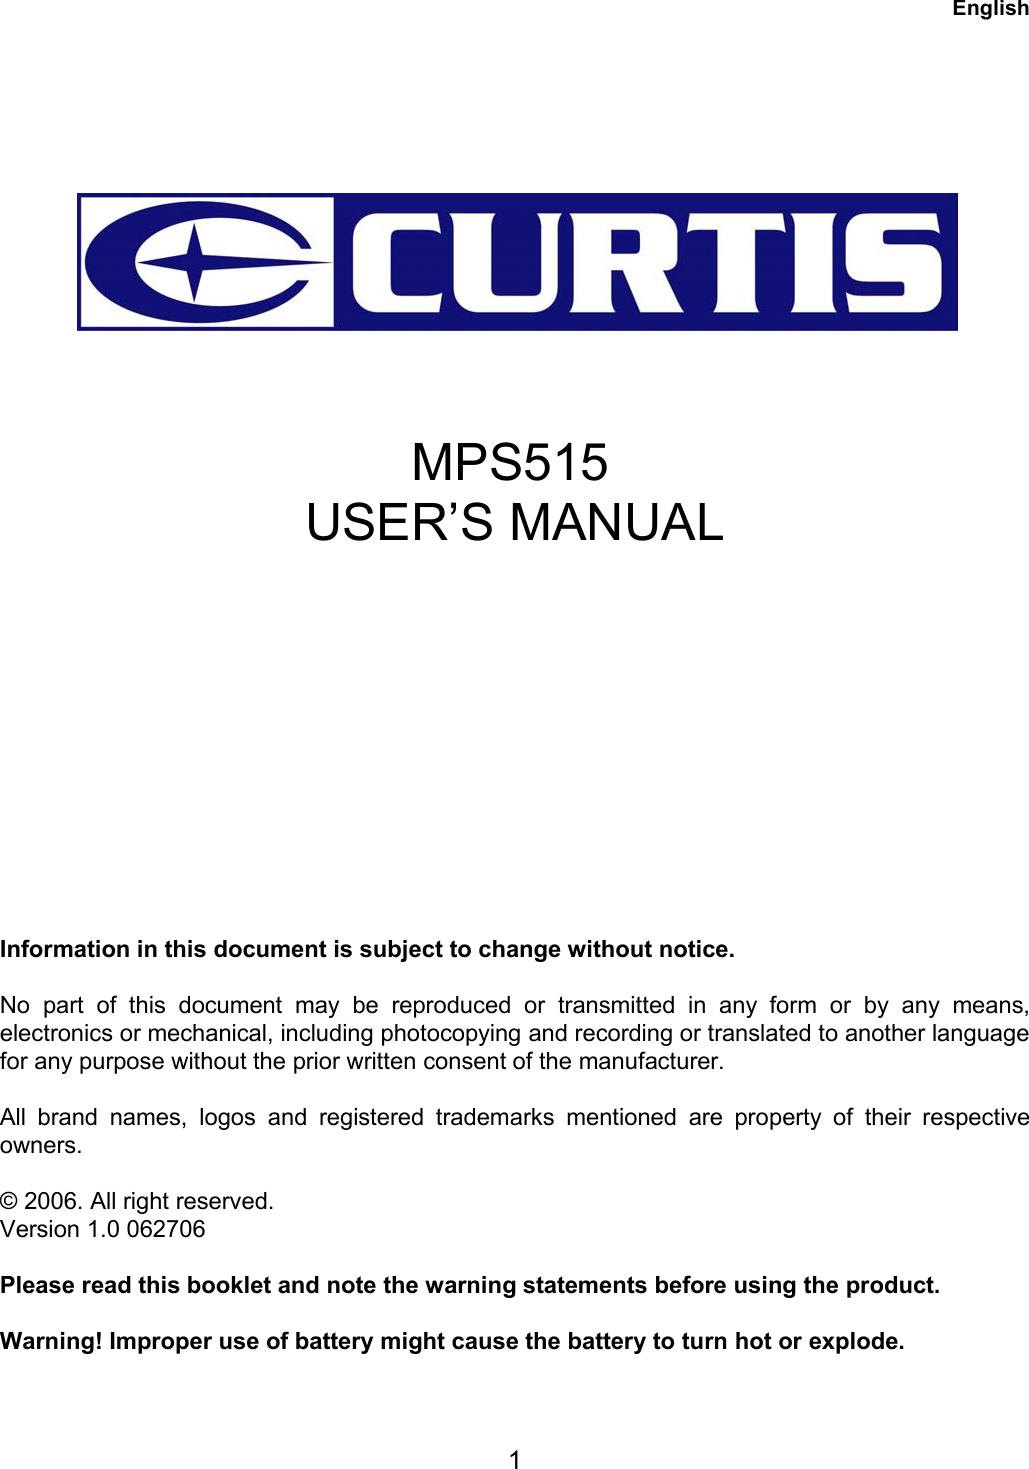 CURTIS MPS515 WINDOWS 7 64BIT DRIVER